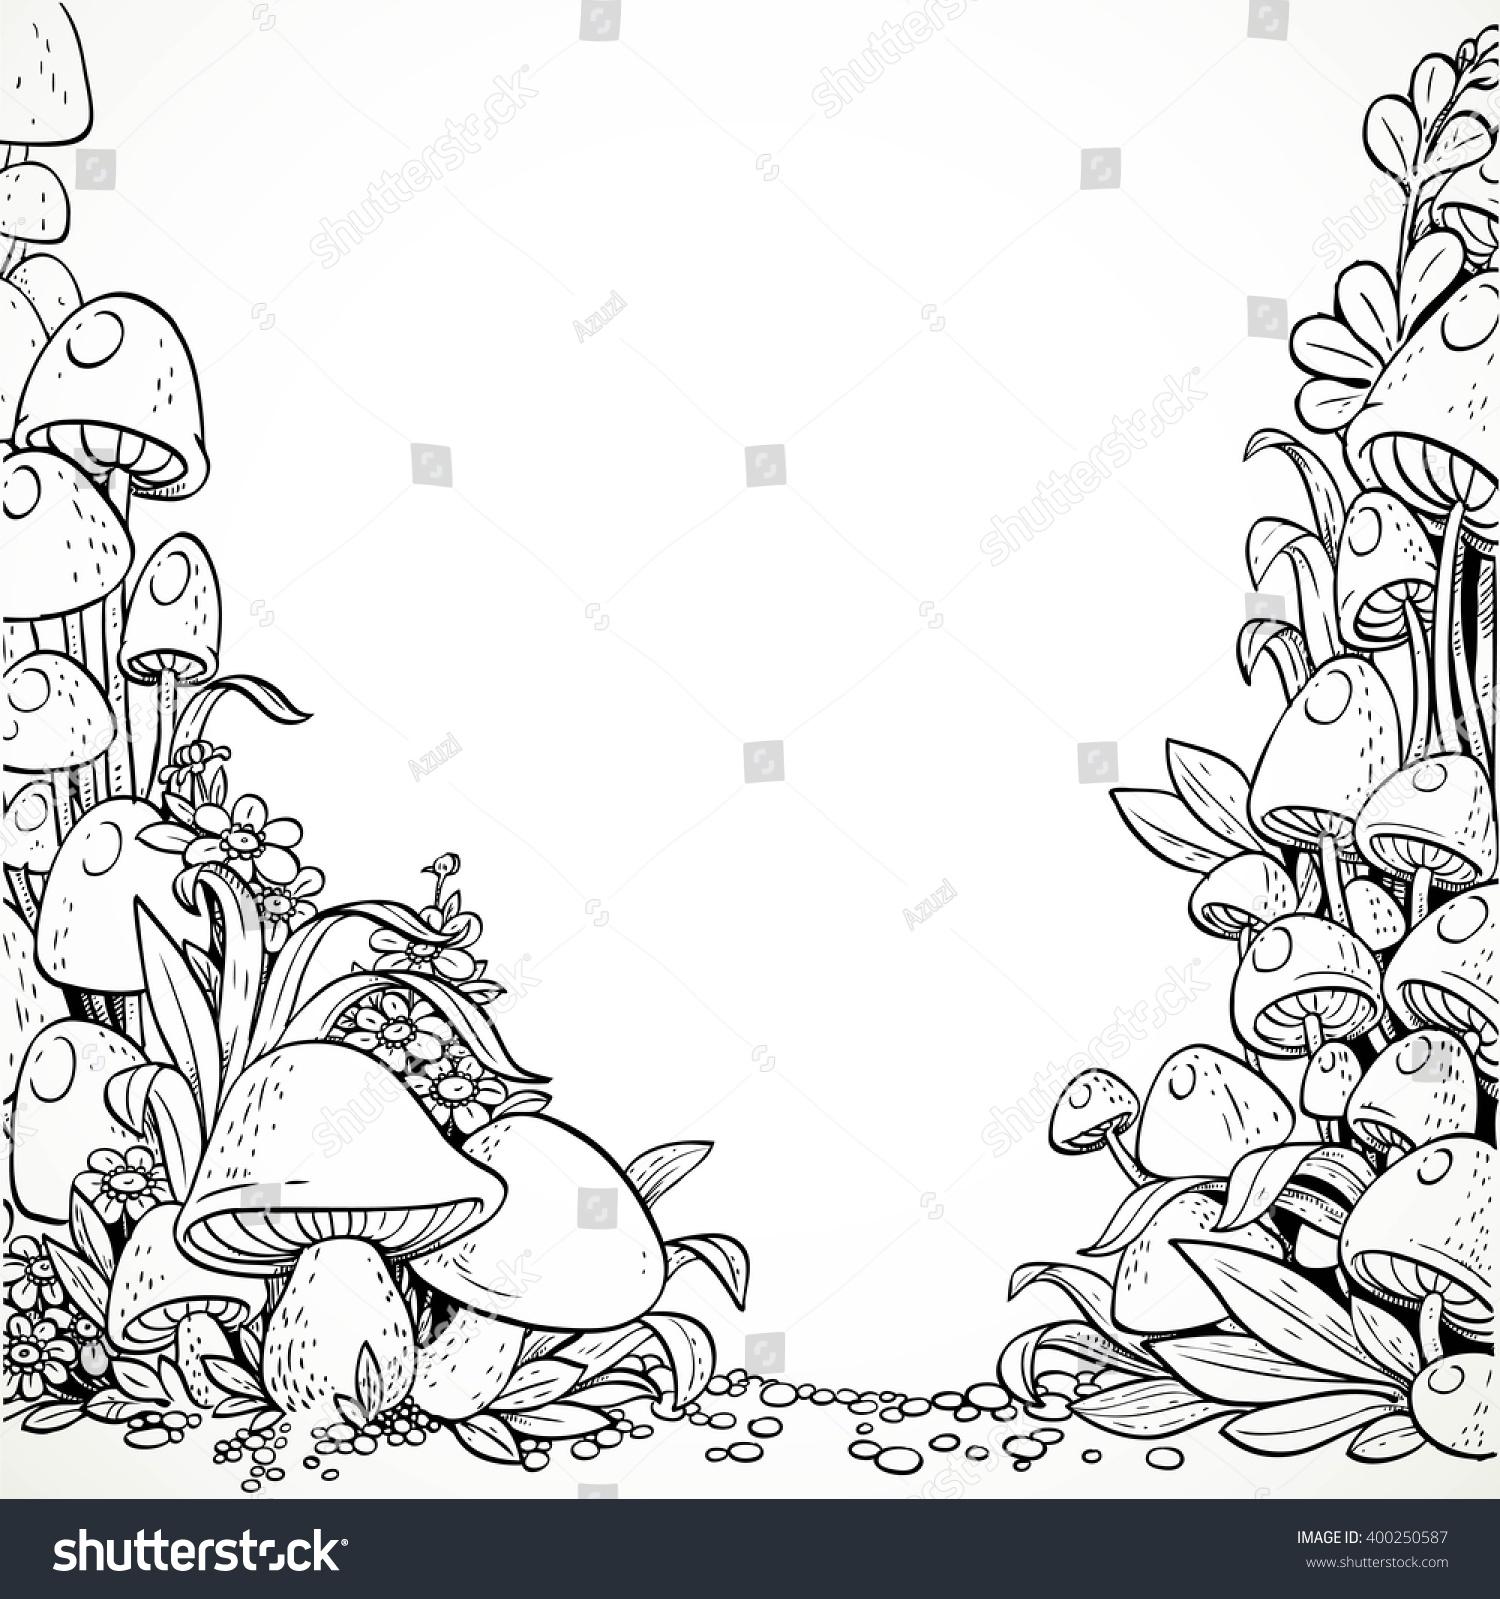 Fairytale Decorative Graphics Mushrooms Flowers Magic Stock Vector